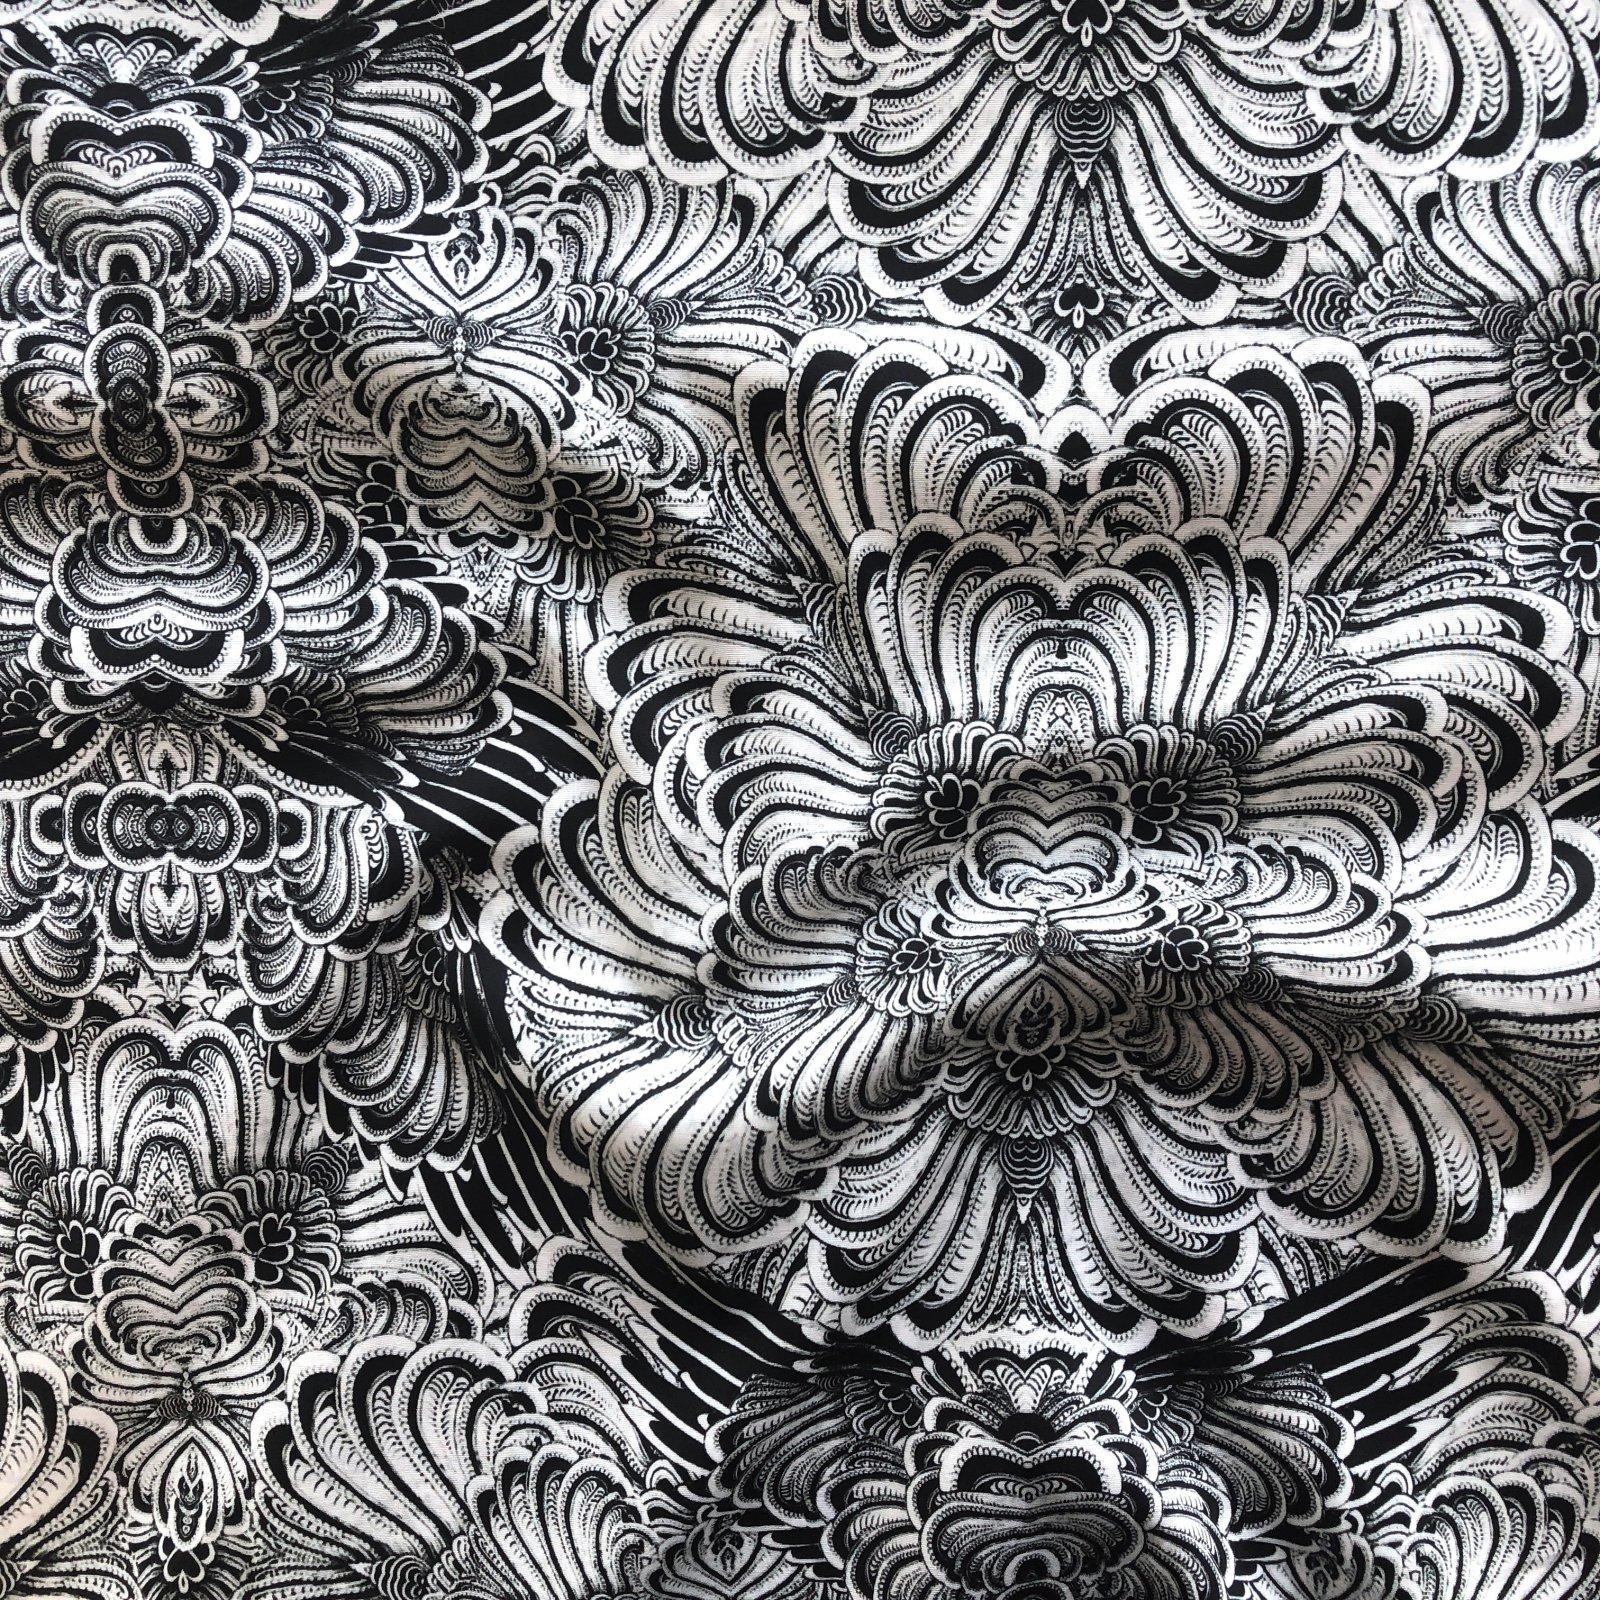 Cavalli - Cotton Lawn - Psychadelia